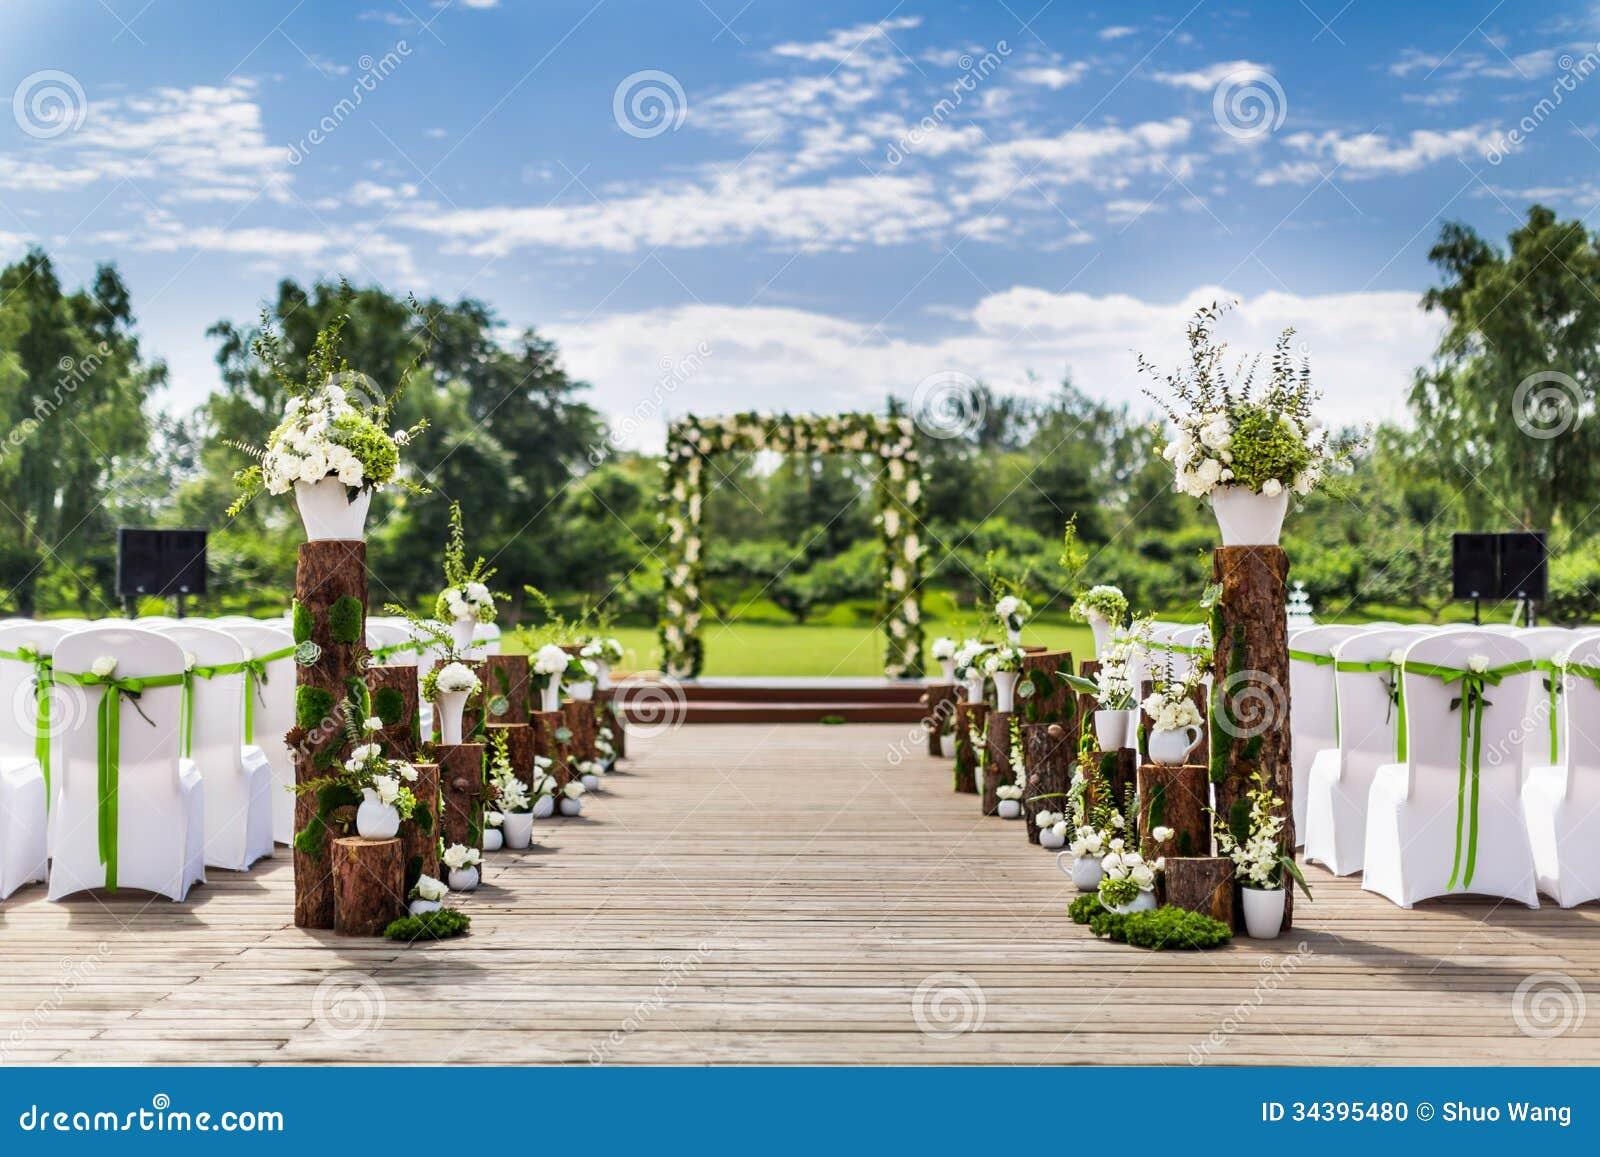 Outdoor Wedding Scene Stock Photo Image 34395480